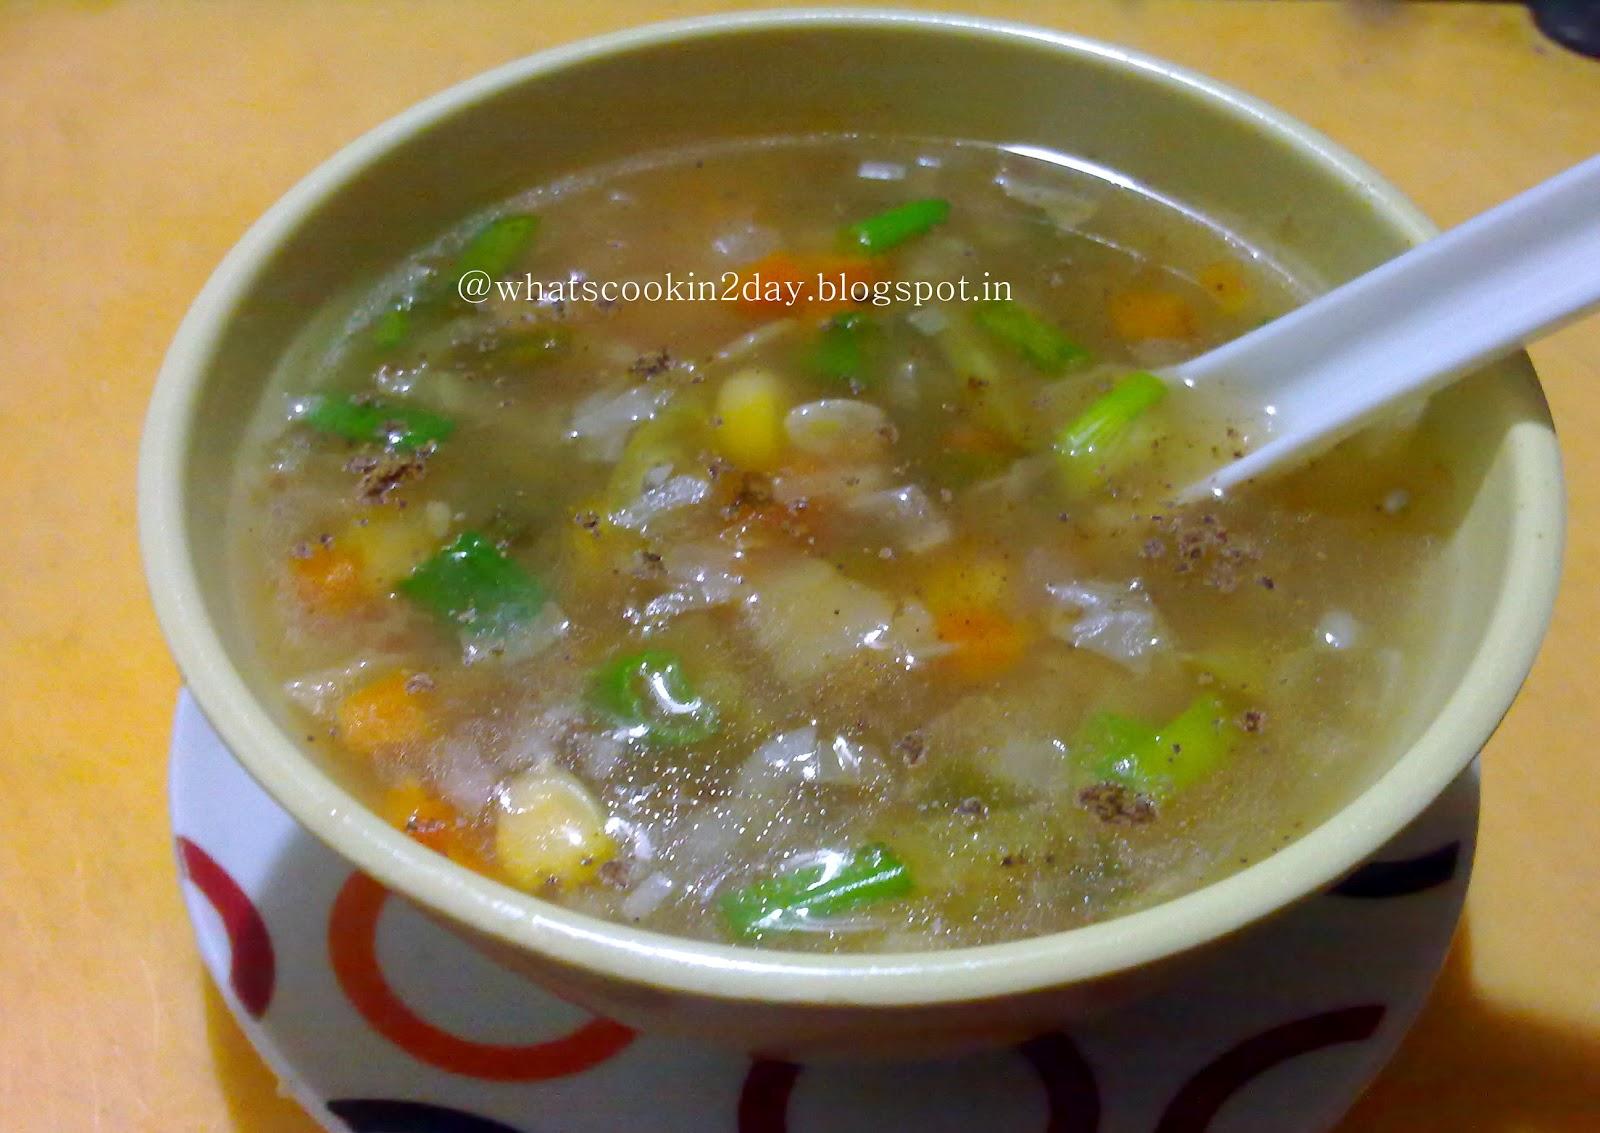 PAVITRA'S KITCHEN: Veg Sweet Corn Soup